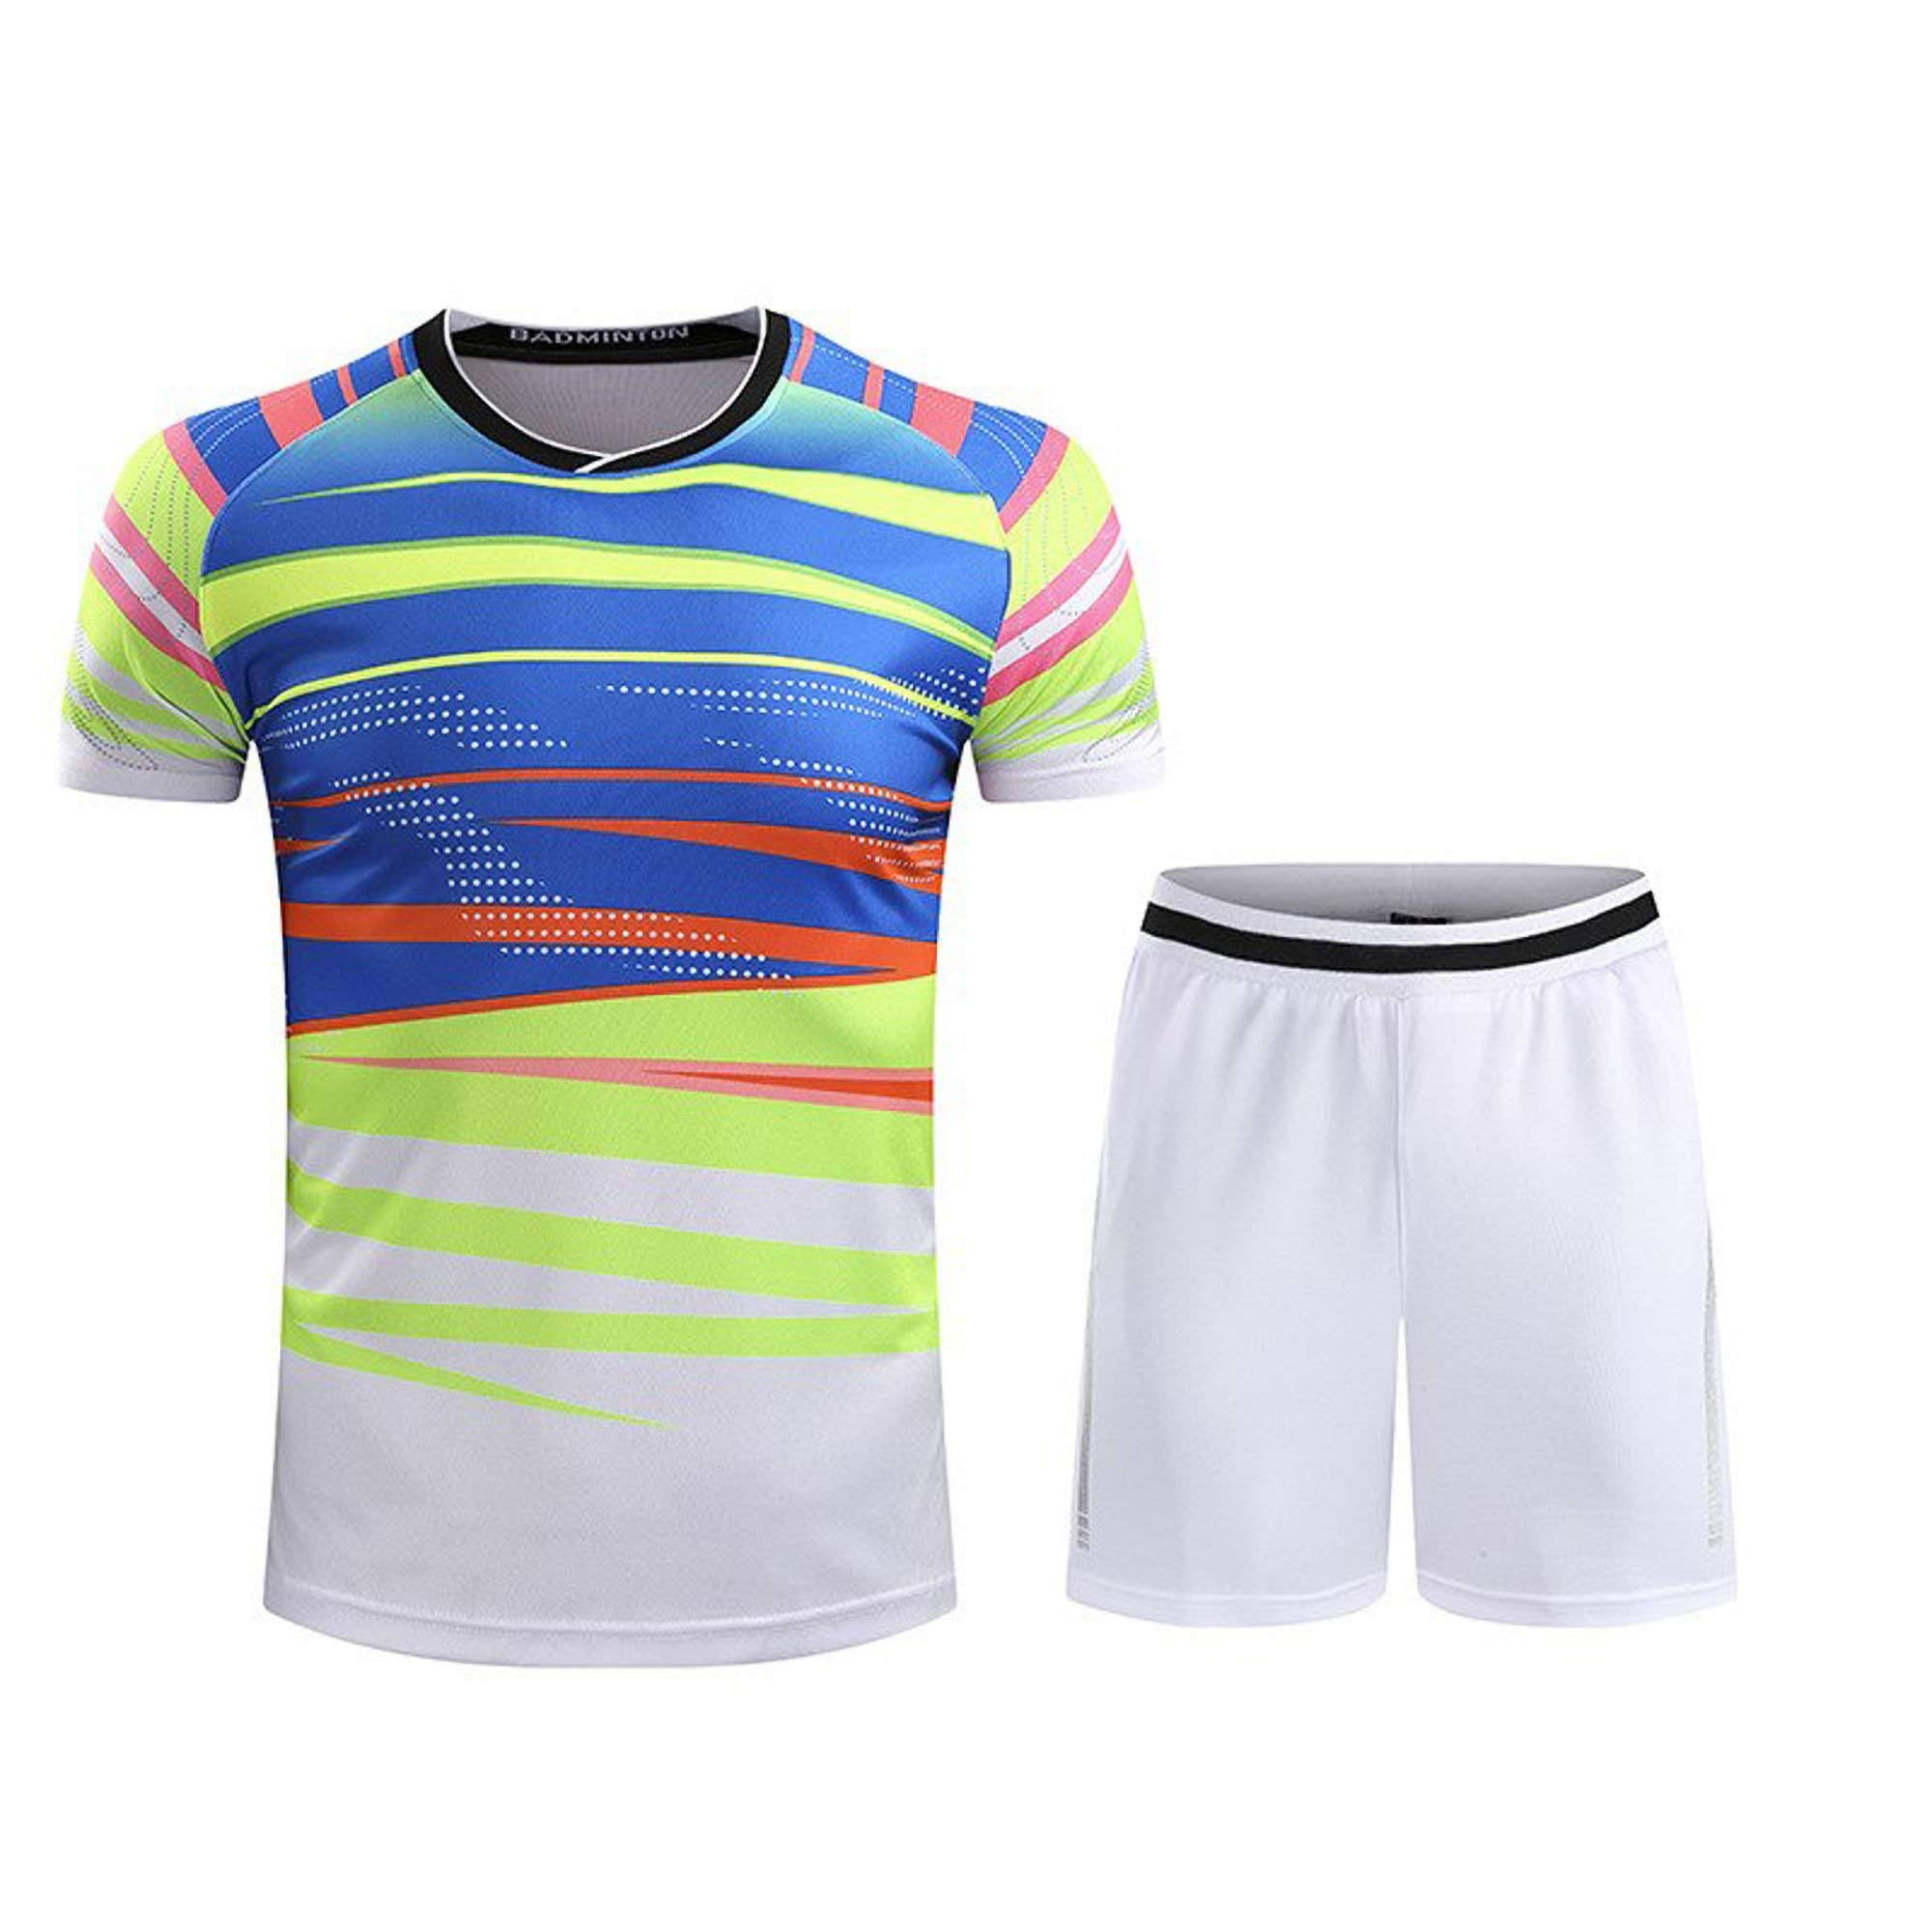 Blank Badminton Jerseys & Shorts Men's Shuttlecock Jersey Table Tennis Training Suit Tennis Sportswear Badminton Shirt & Shorts